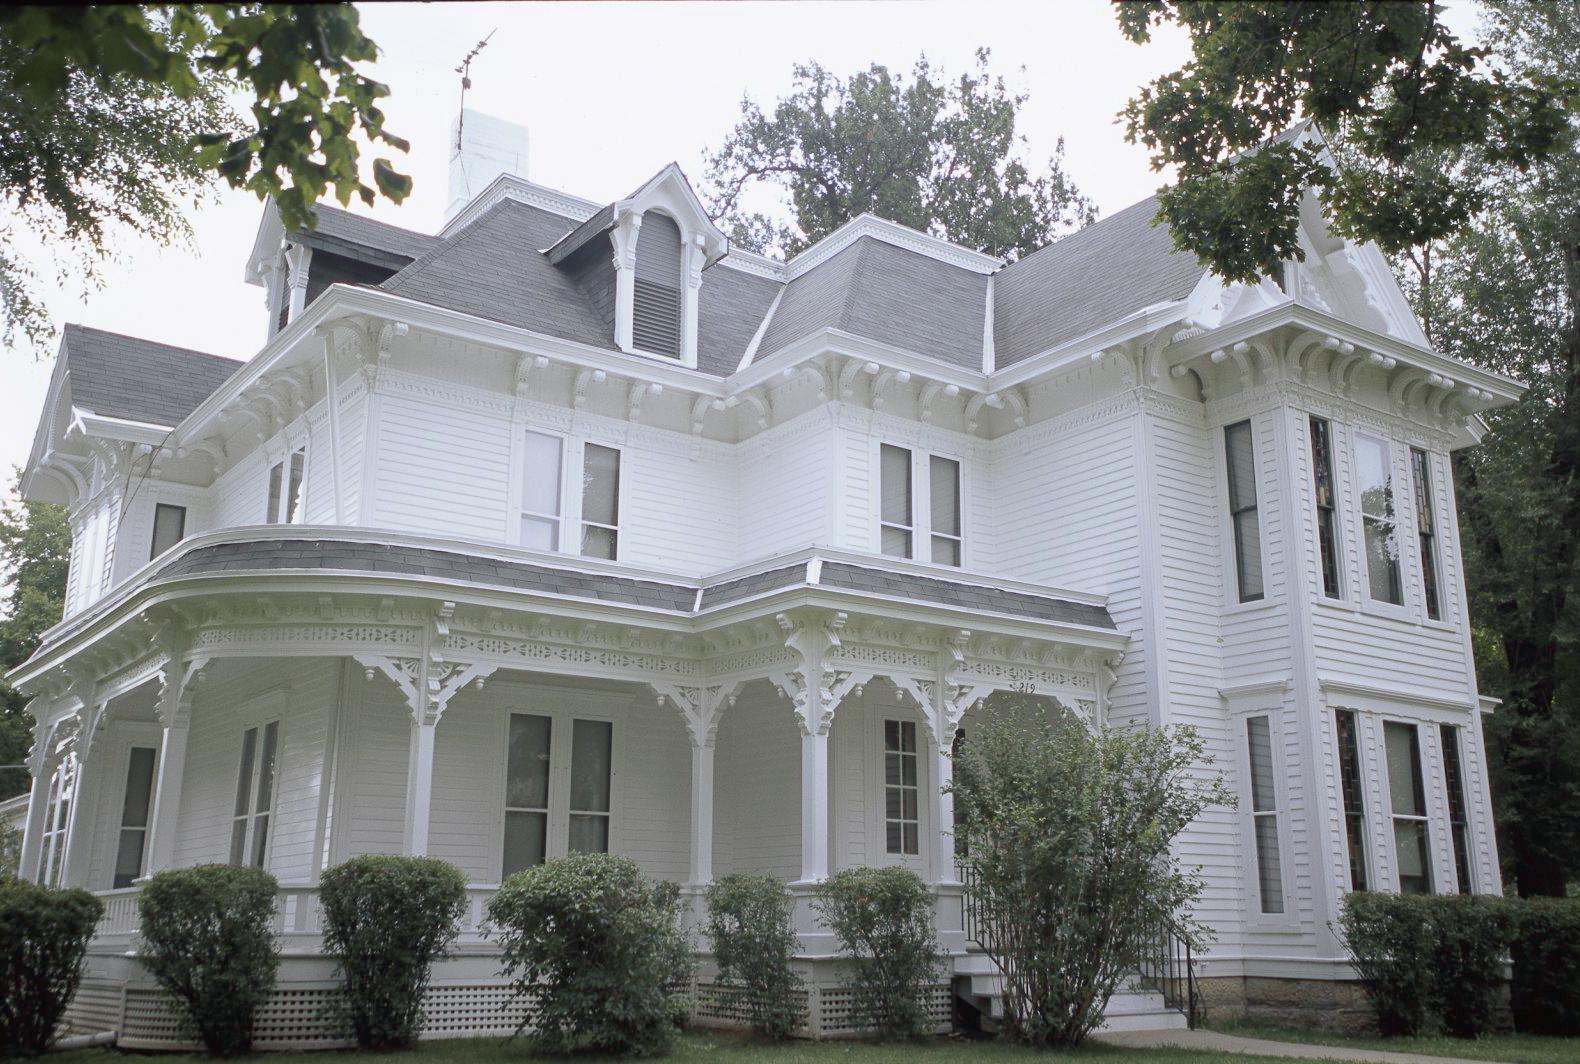 Harry S. Truman's boyhood home